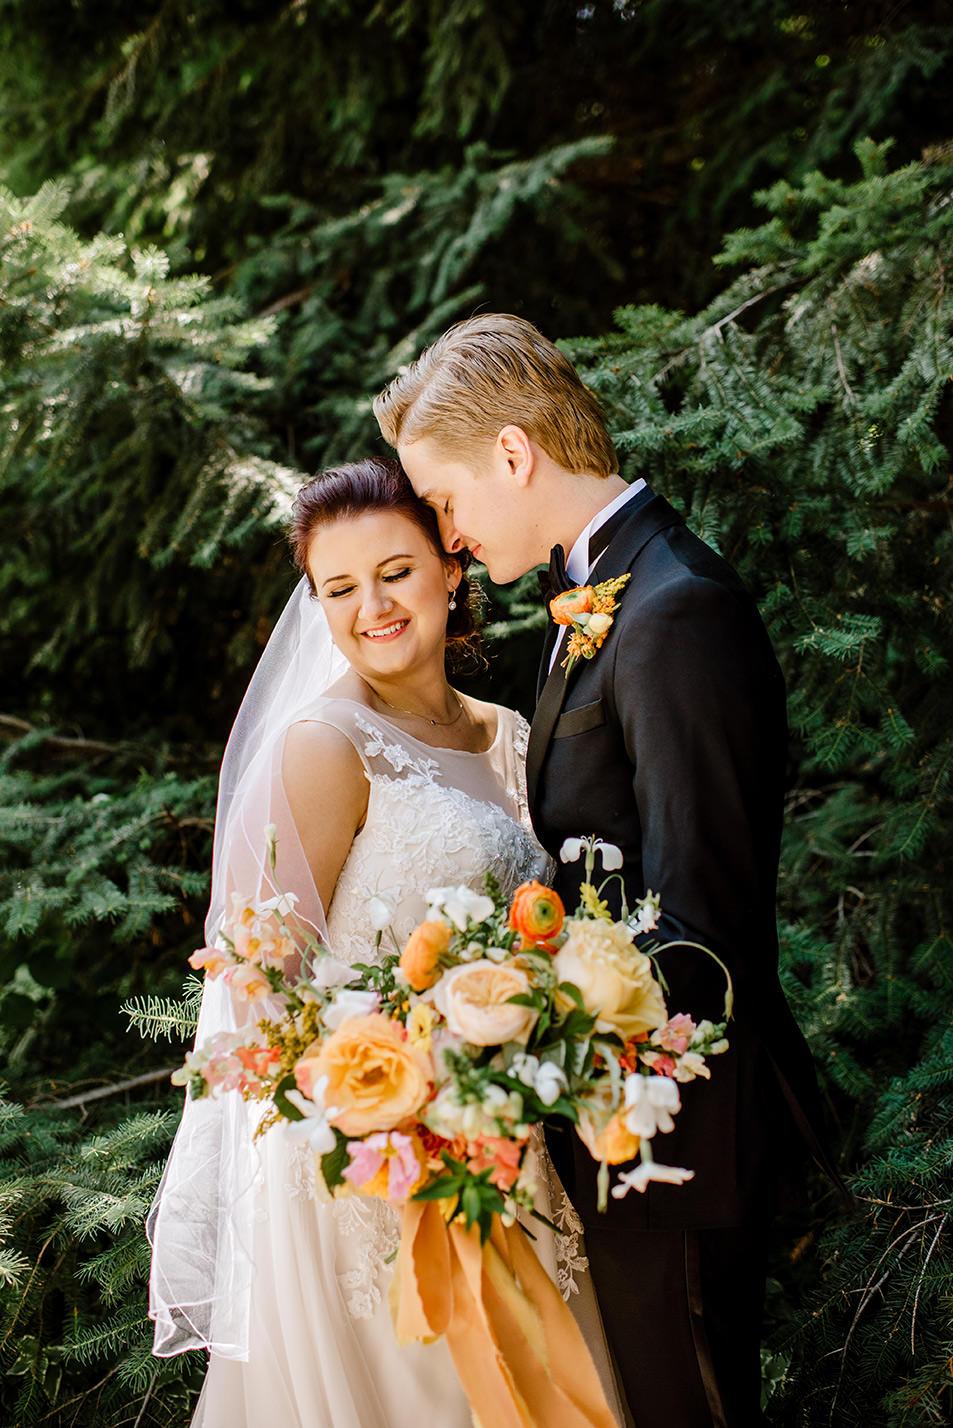 Citrus-inspired-wedding-at-Gorge-Crest-Vineyard-040.jpg